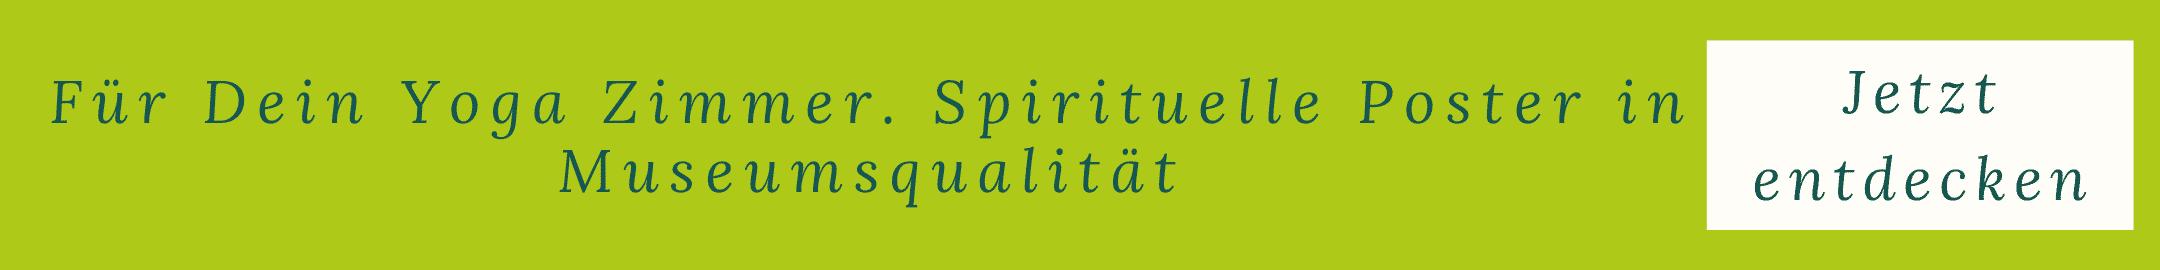 Spirituelle Poster in Museumsqualität